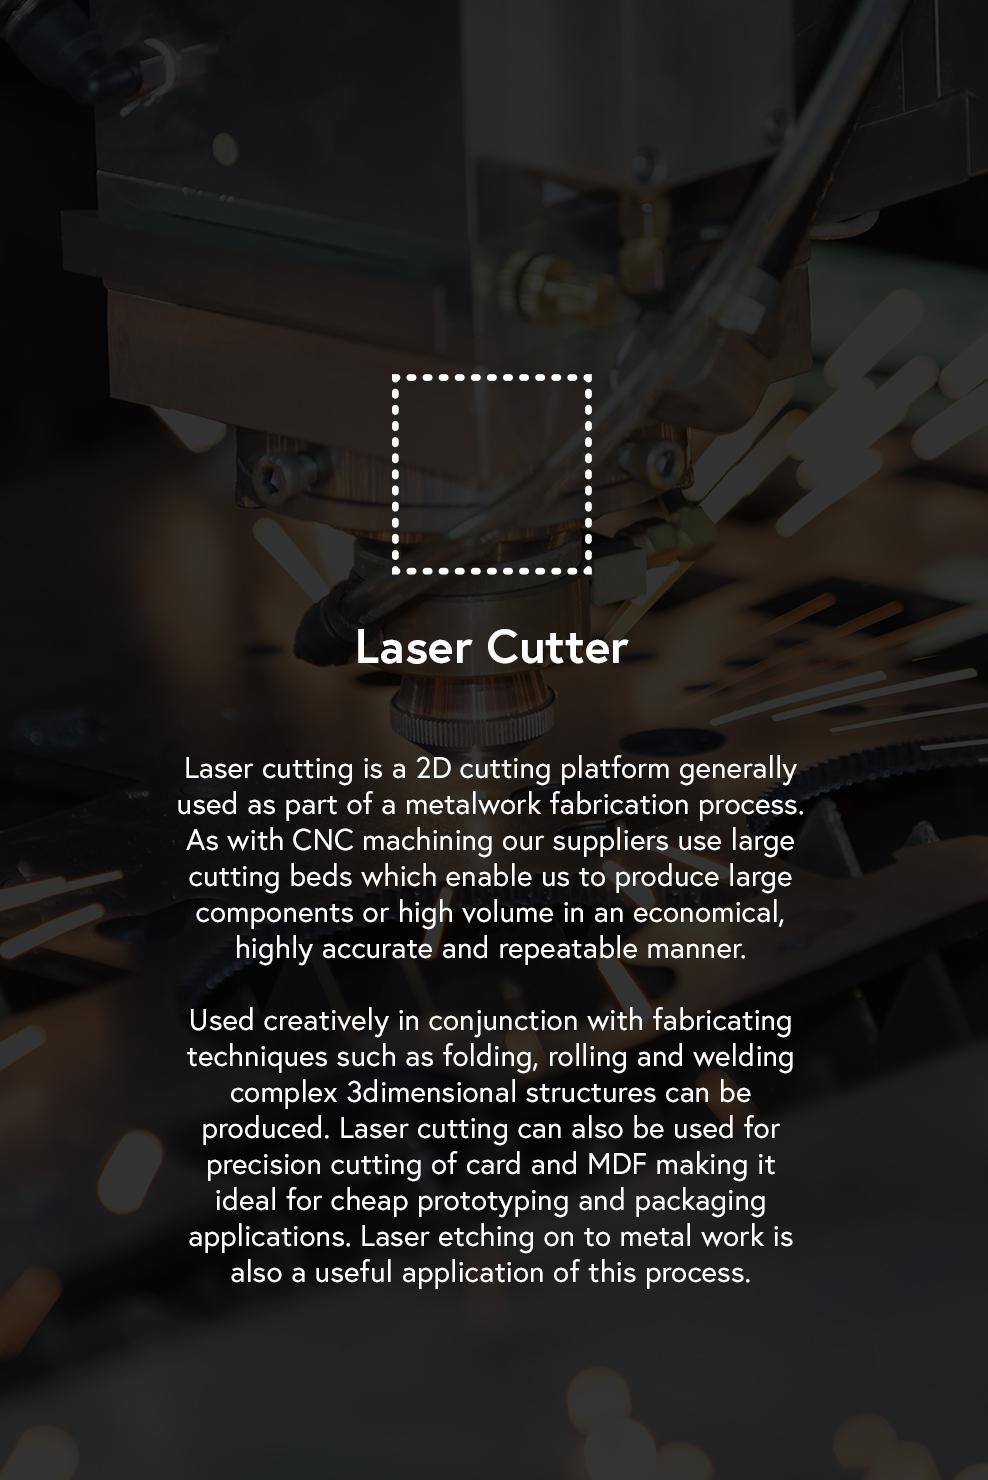 laser-cutter.jpg